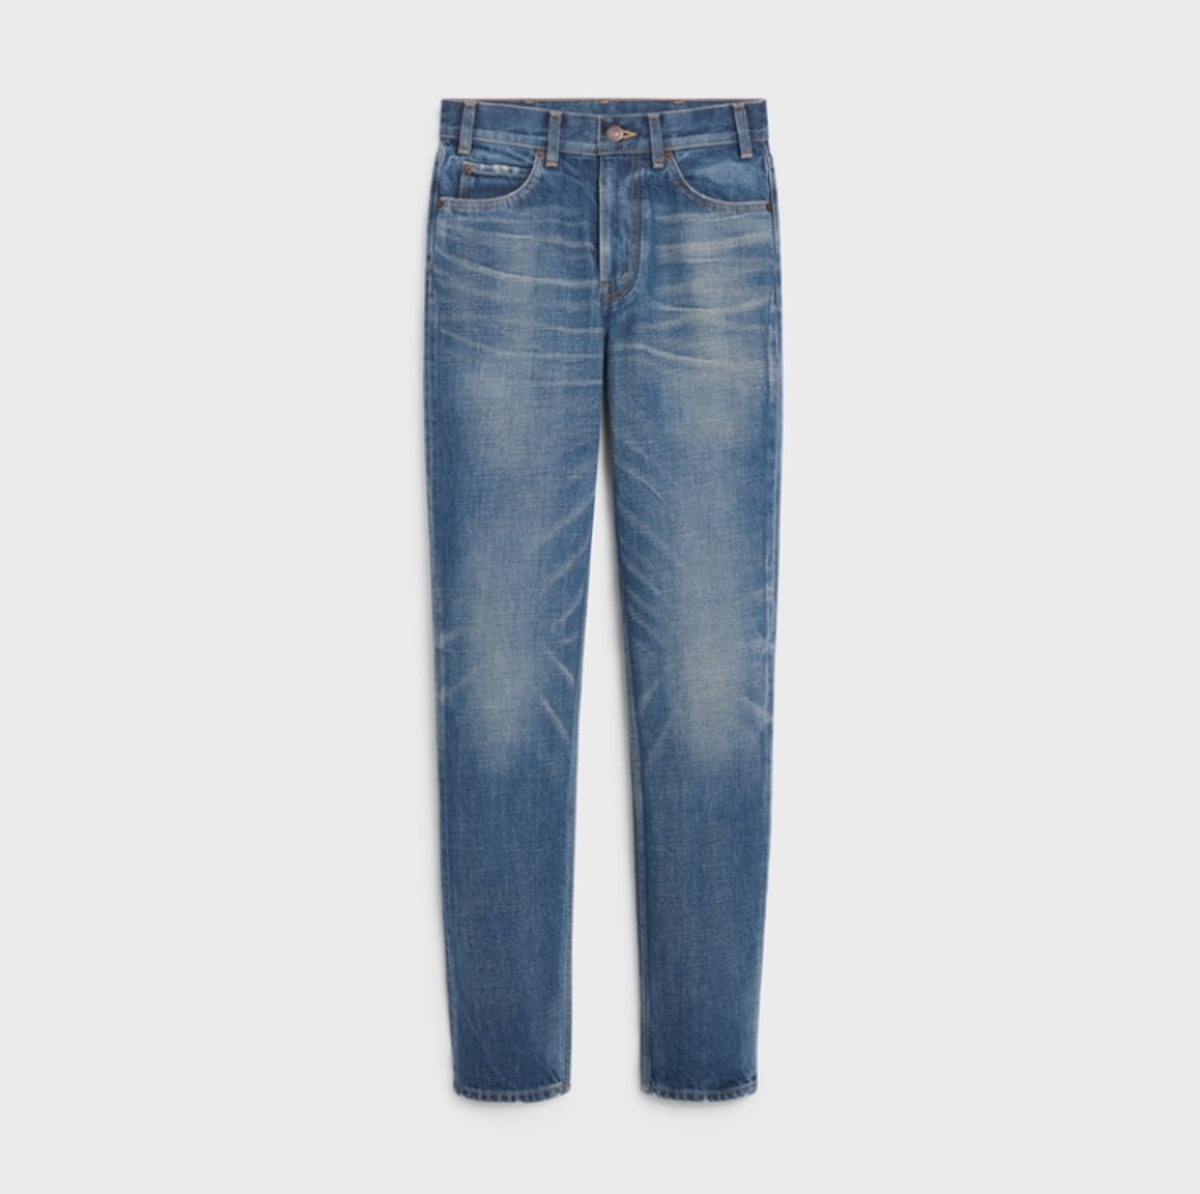 CELINE's slim-fit jeans in dark union wash.